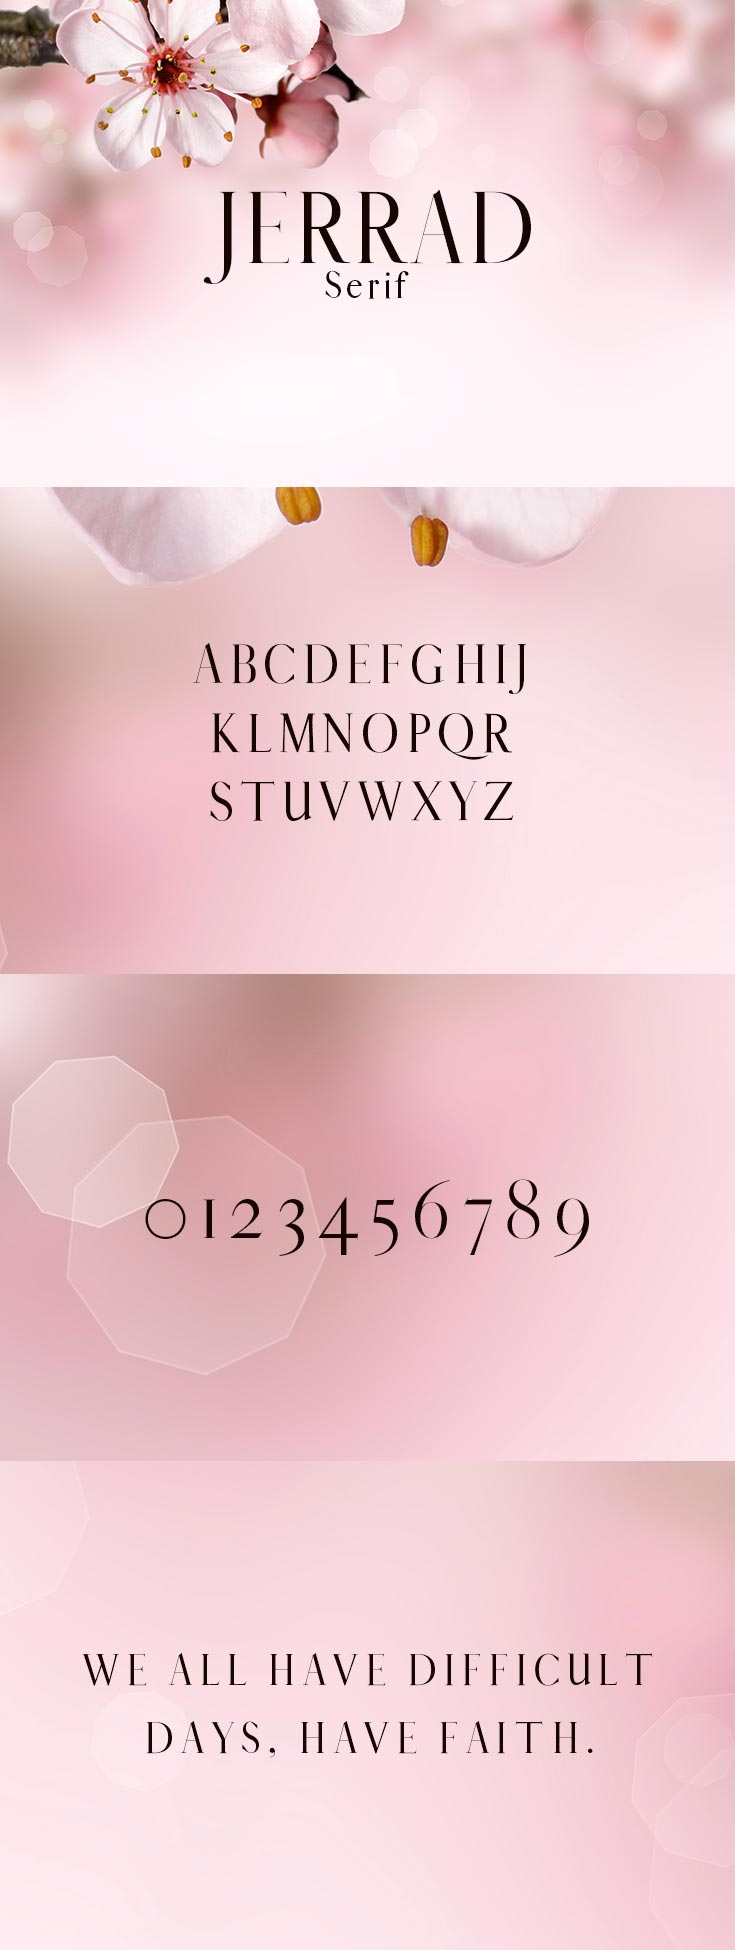 Free Jerrad Serif Demo Font